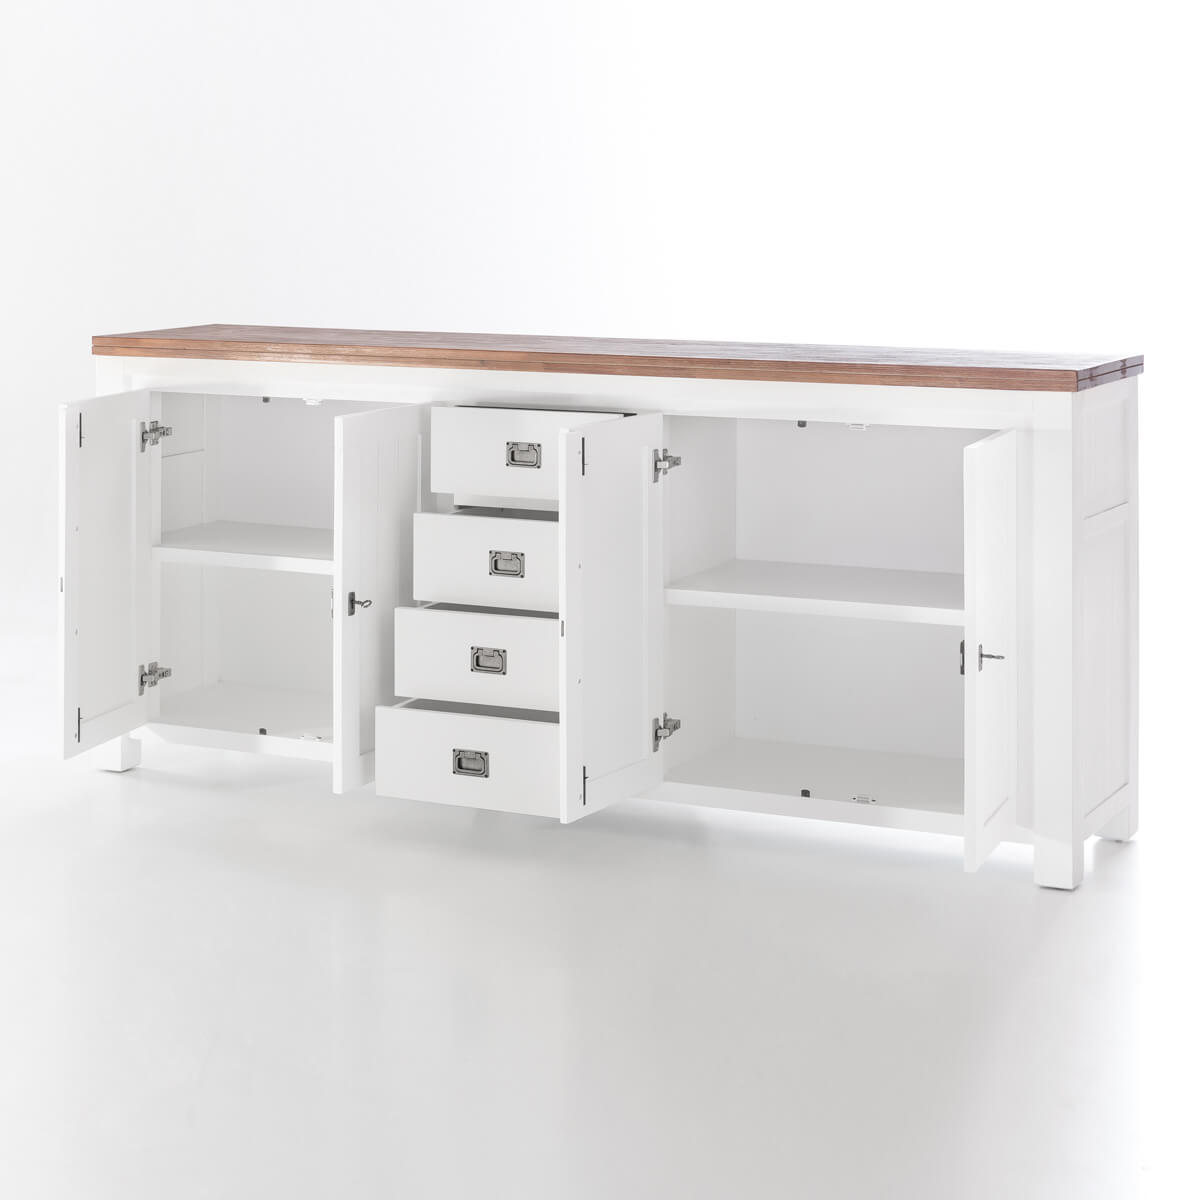 sideboard in akazie massiv kommode wei braun massivholz 210 cm neu ebay. Black Bedroom Furniture Sets. Home Design Ideas